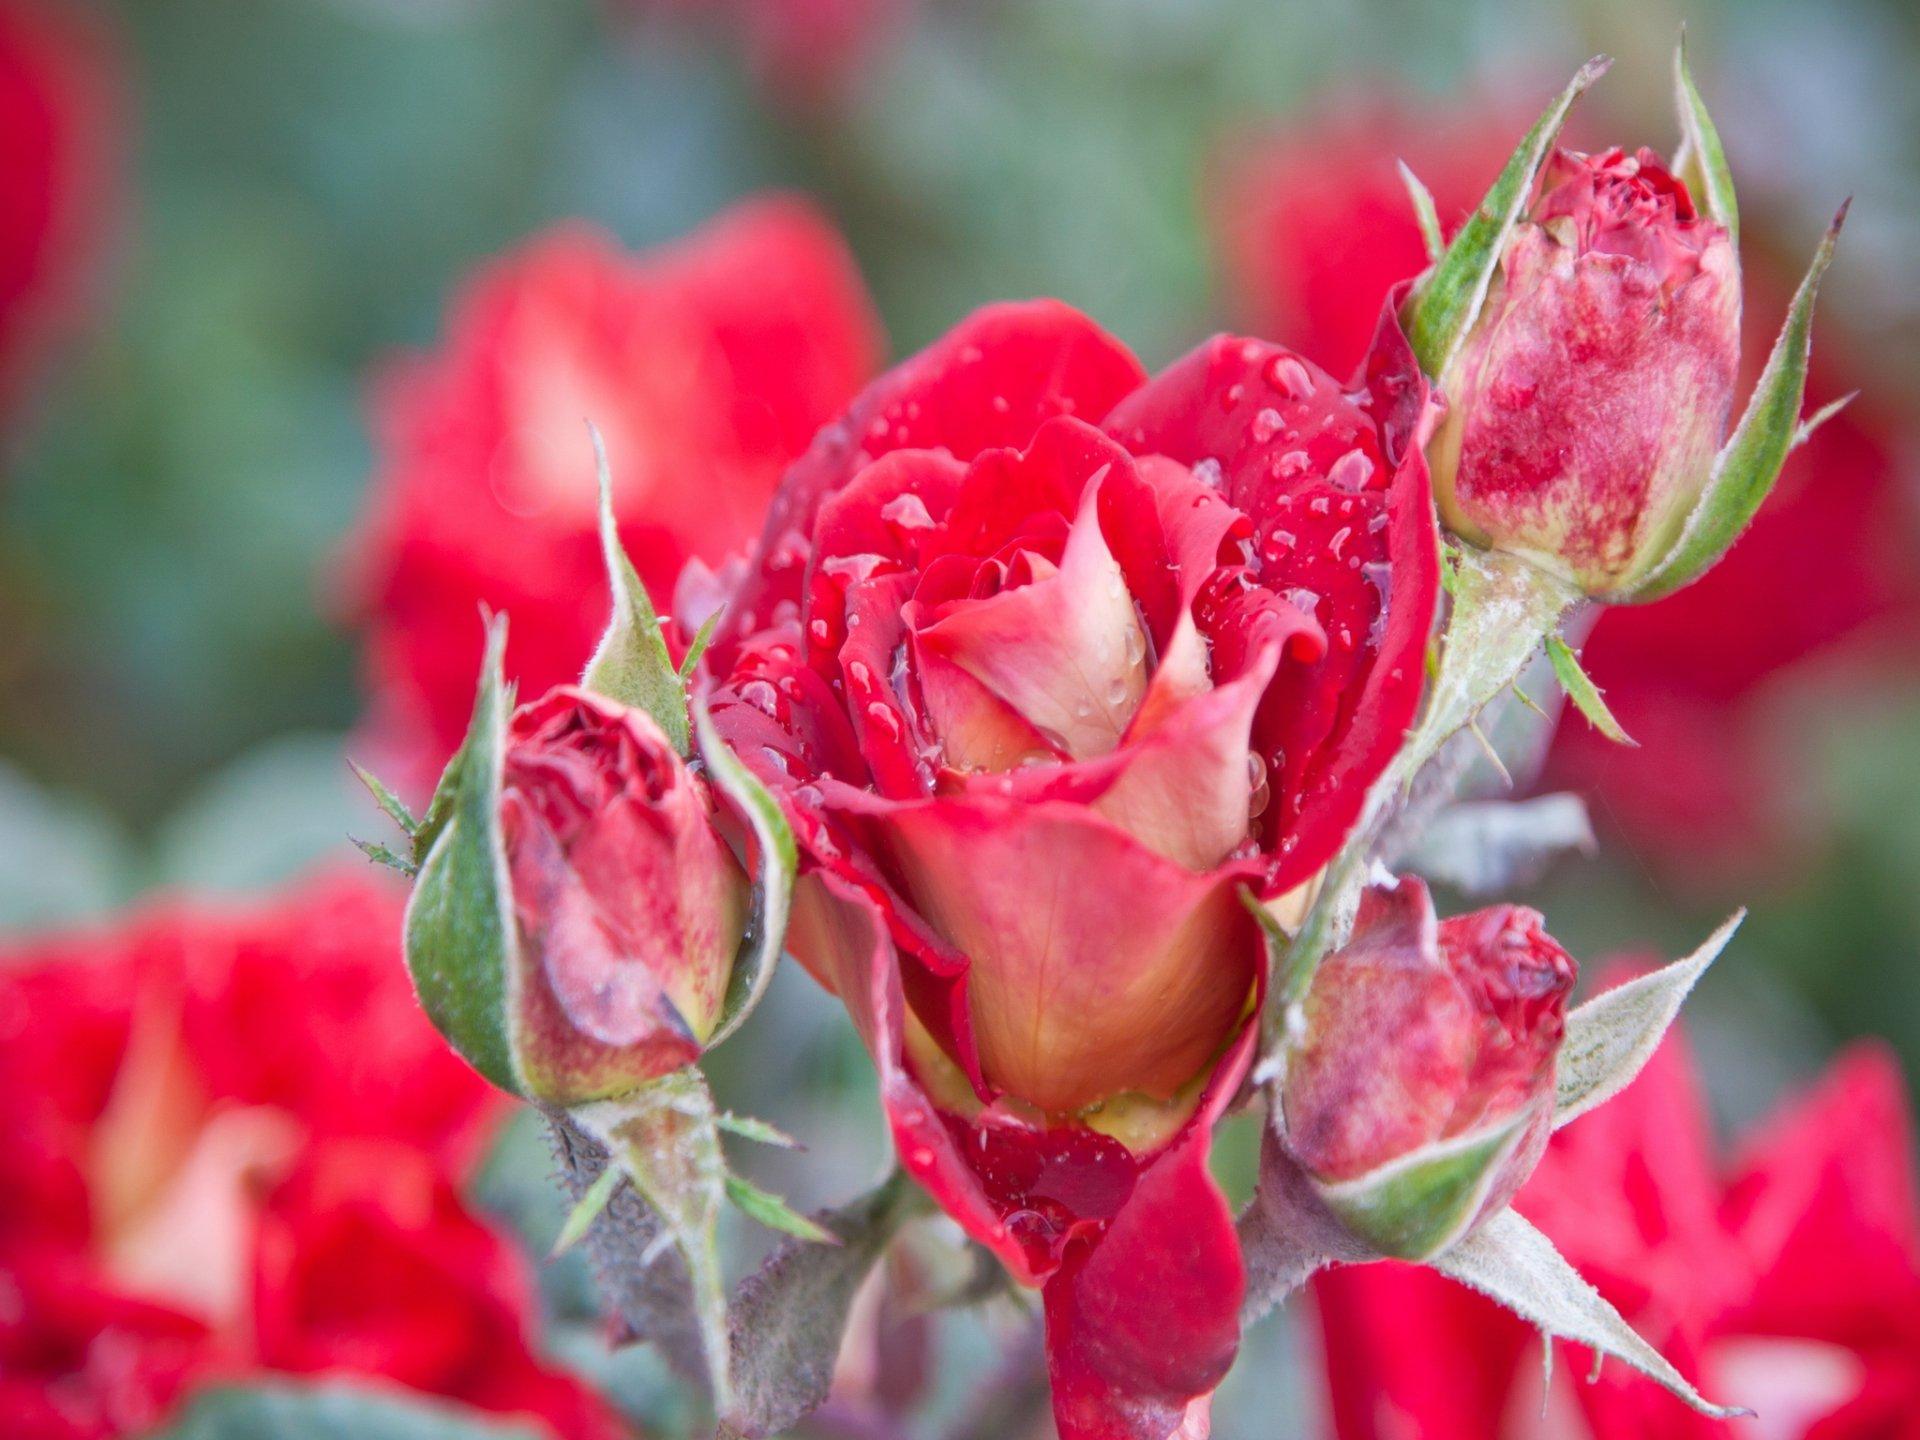 Rose full hd fond d 39 cran and arri re plan 2048x1536 id 302595 - Catalogue de fleurs gratuit ...